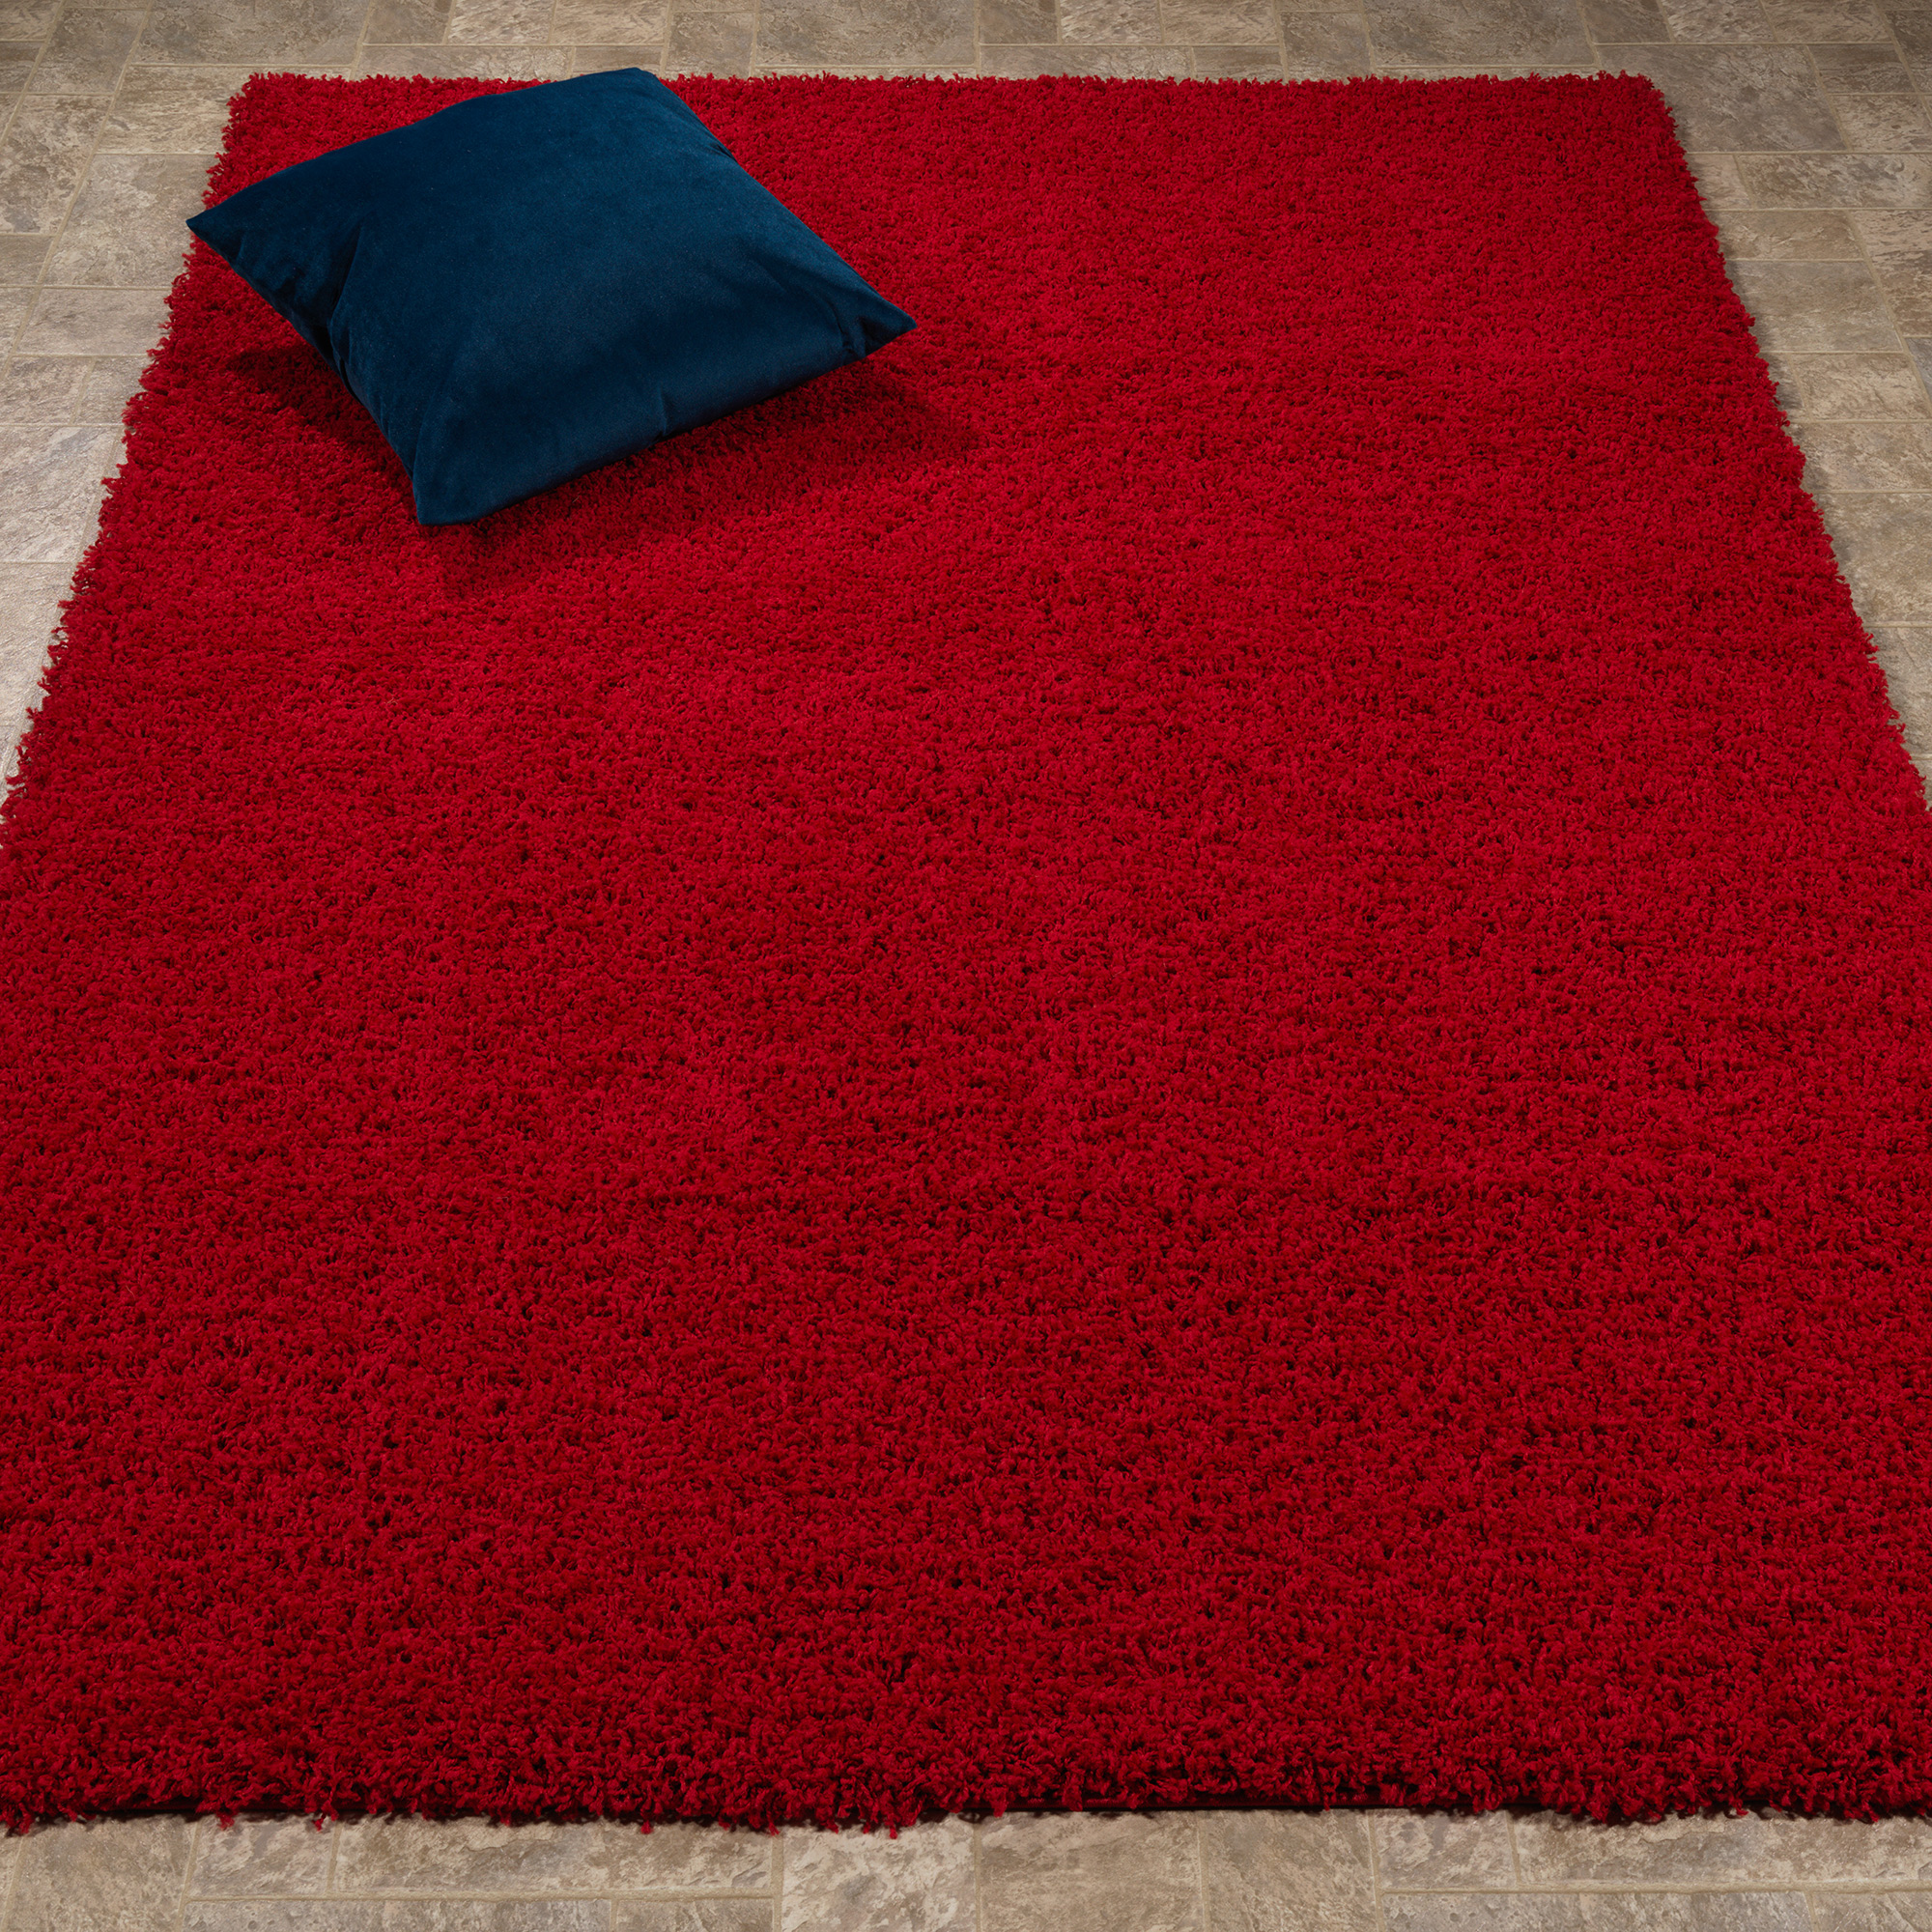 "Berrnour Home Berrland Solid Plush Soft Shag Living room & Bedroom Area Rug, 5'3"" X 7'0\ by Berrnour Home"